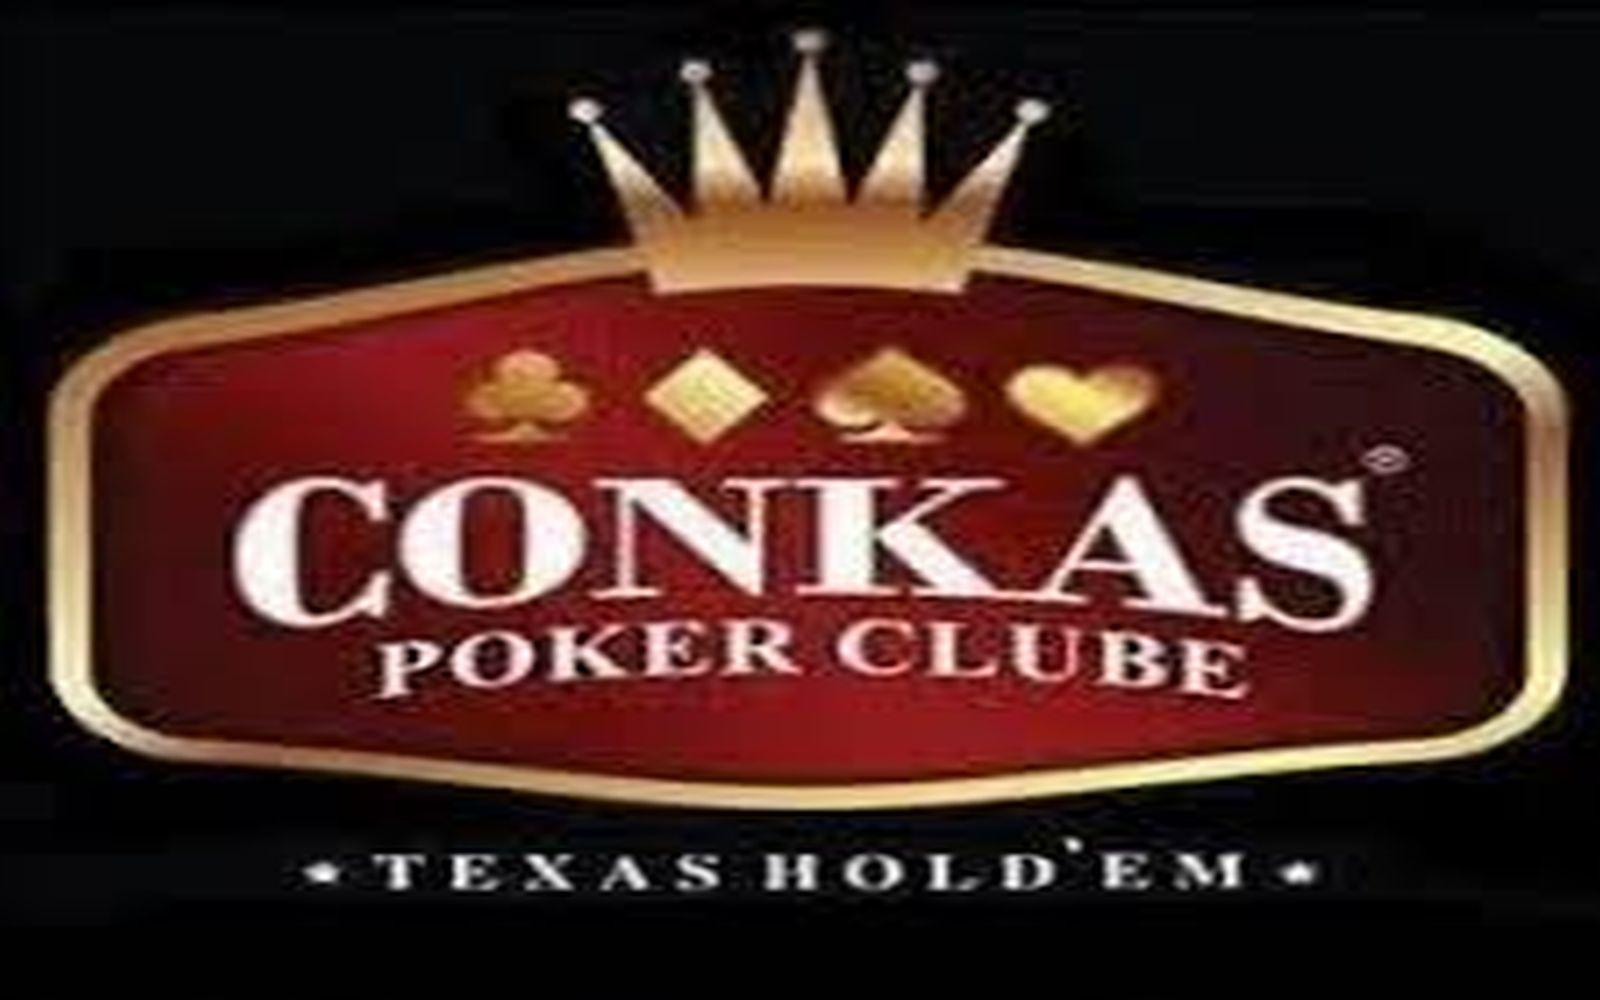 Conkas Poker Clube